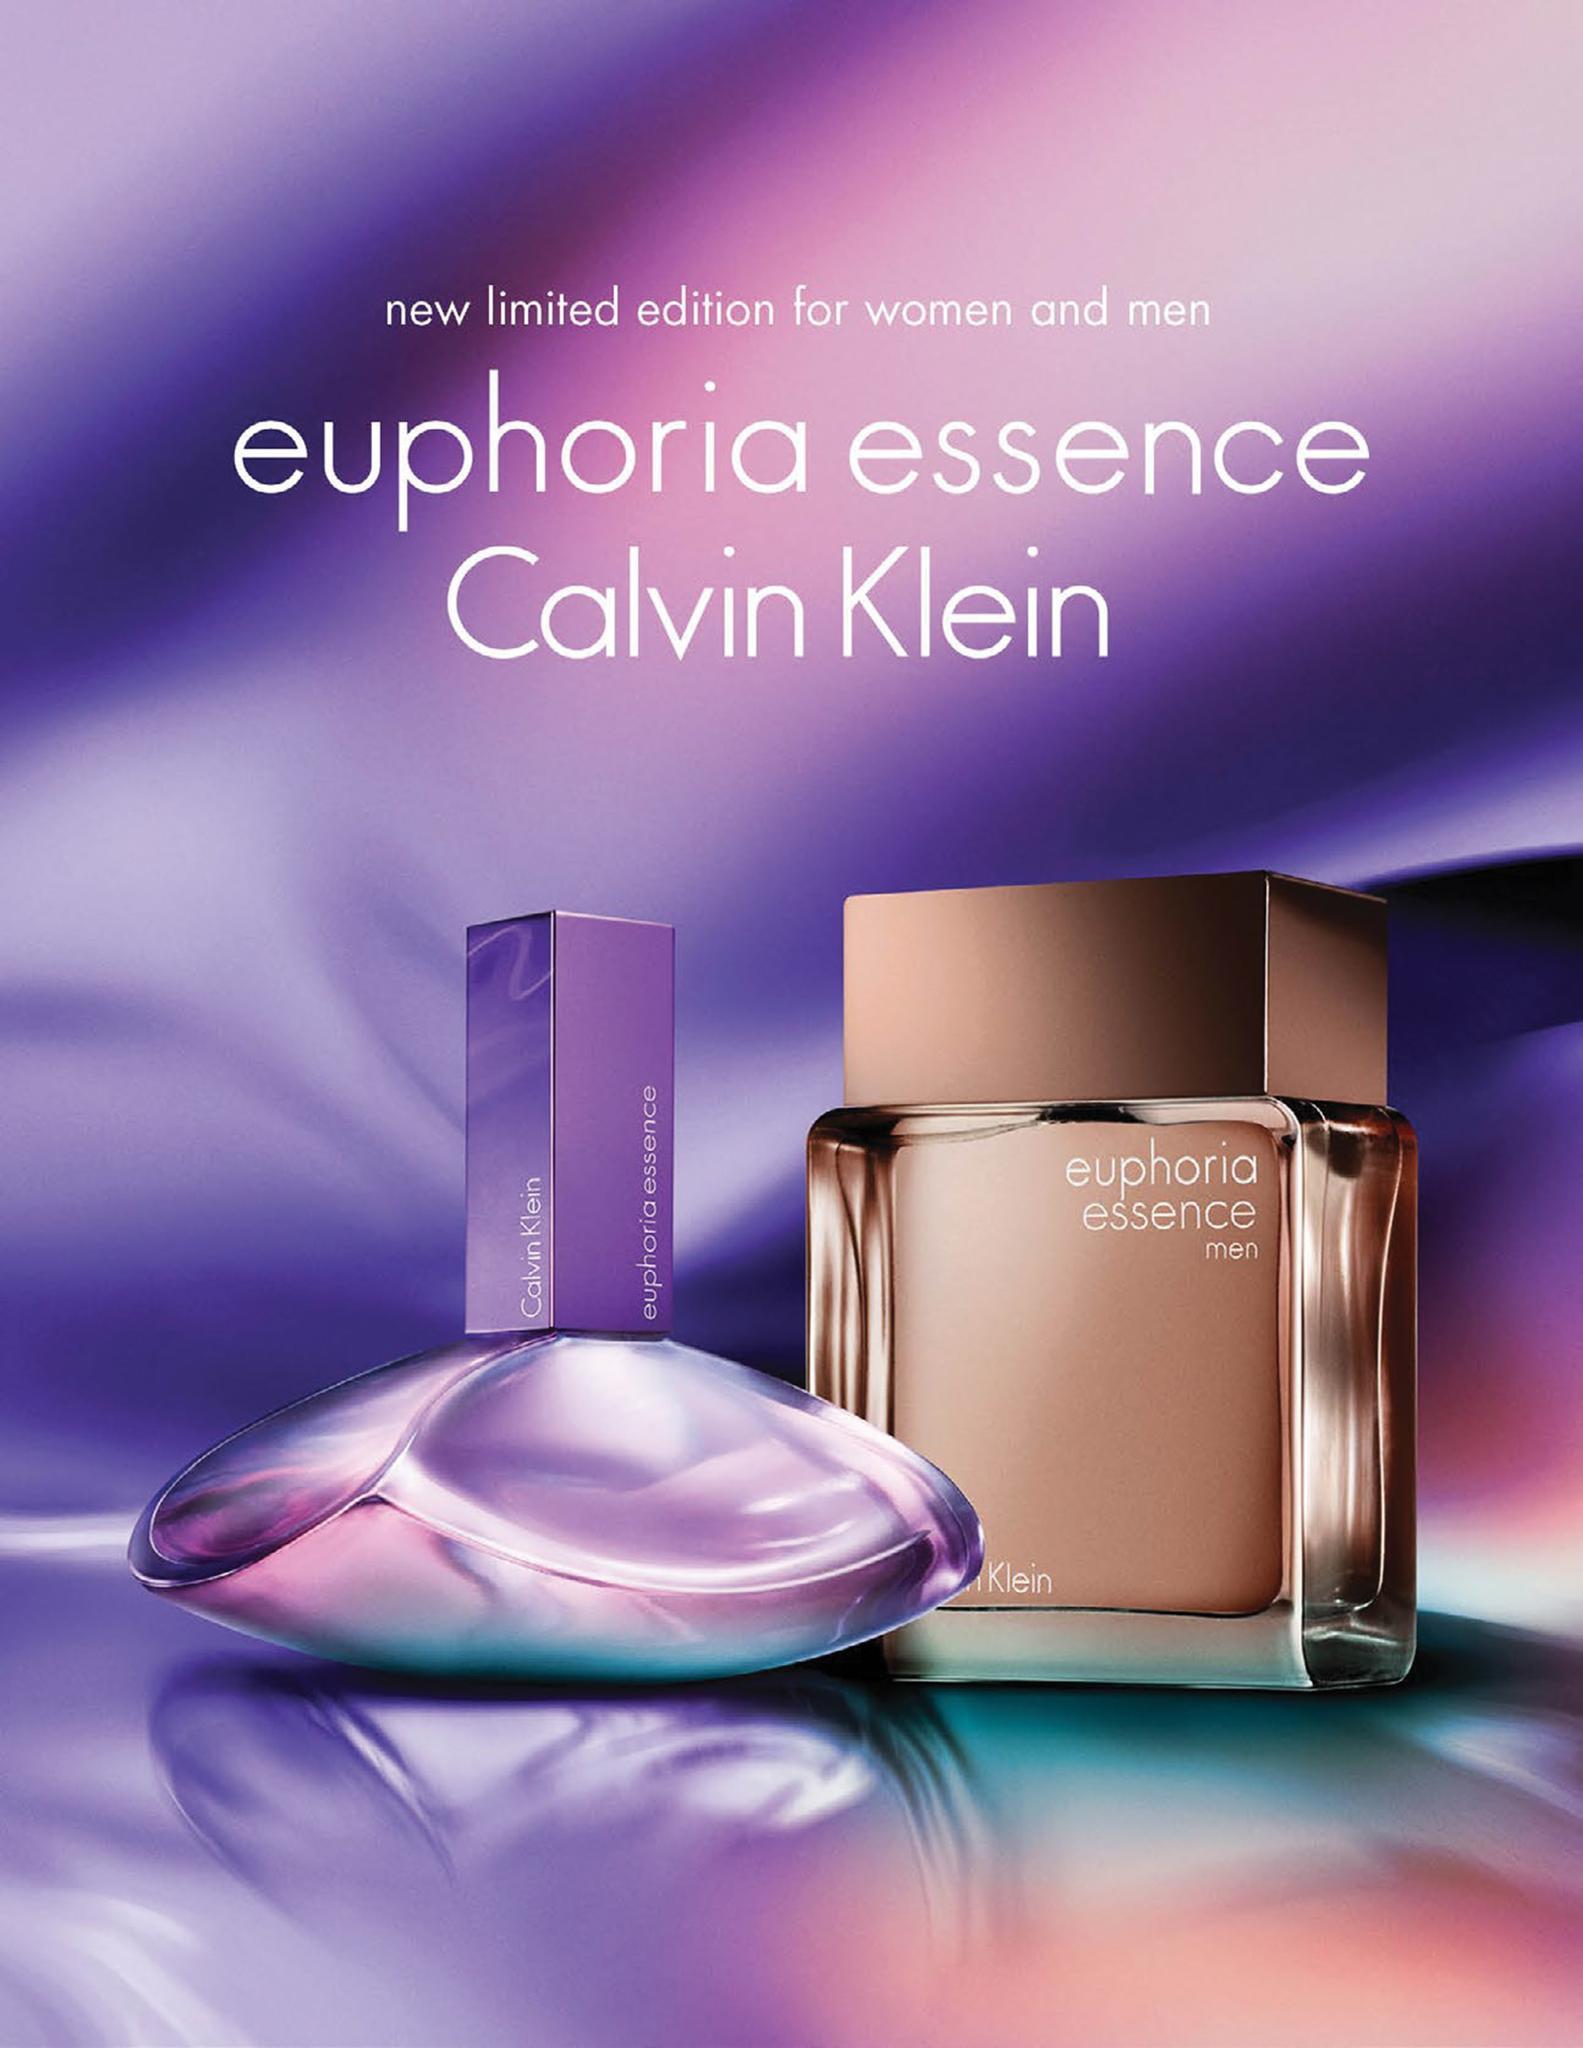 calvin klein euphoria essence amp essence men 2015 new